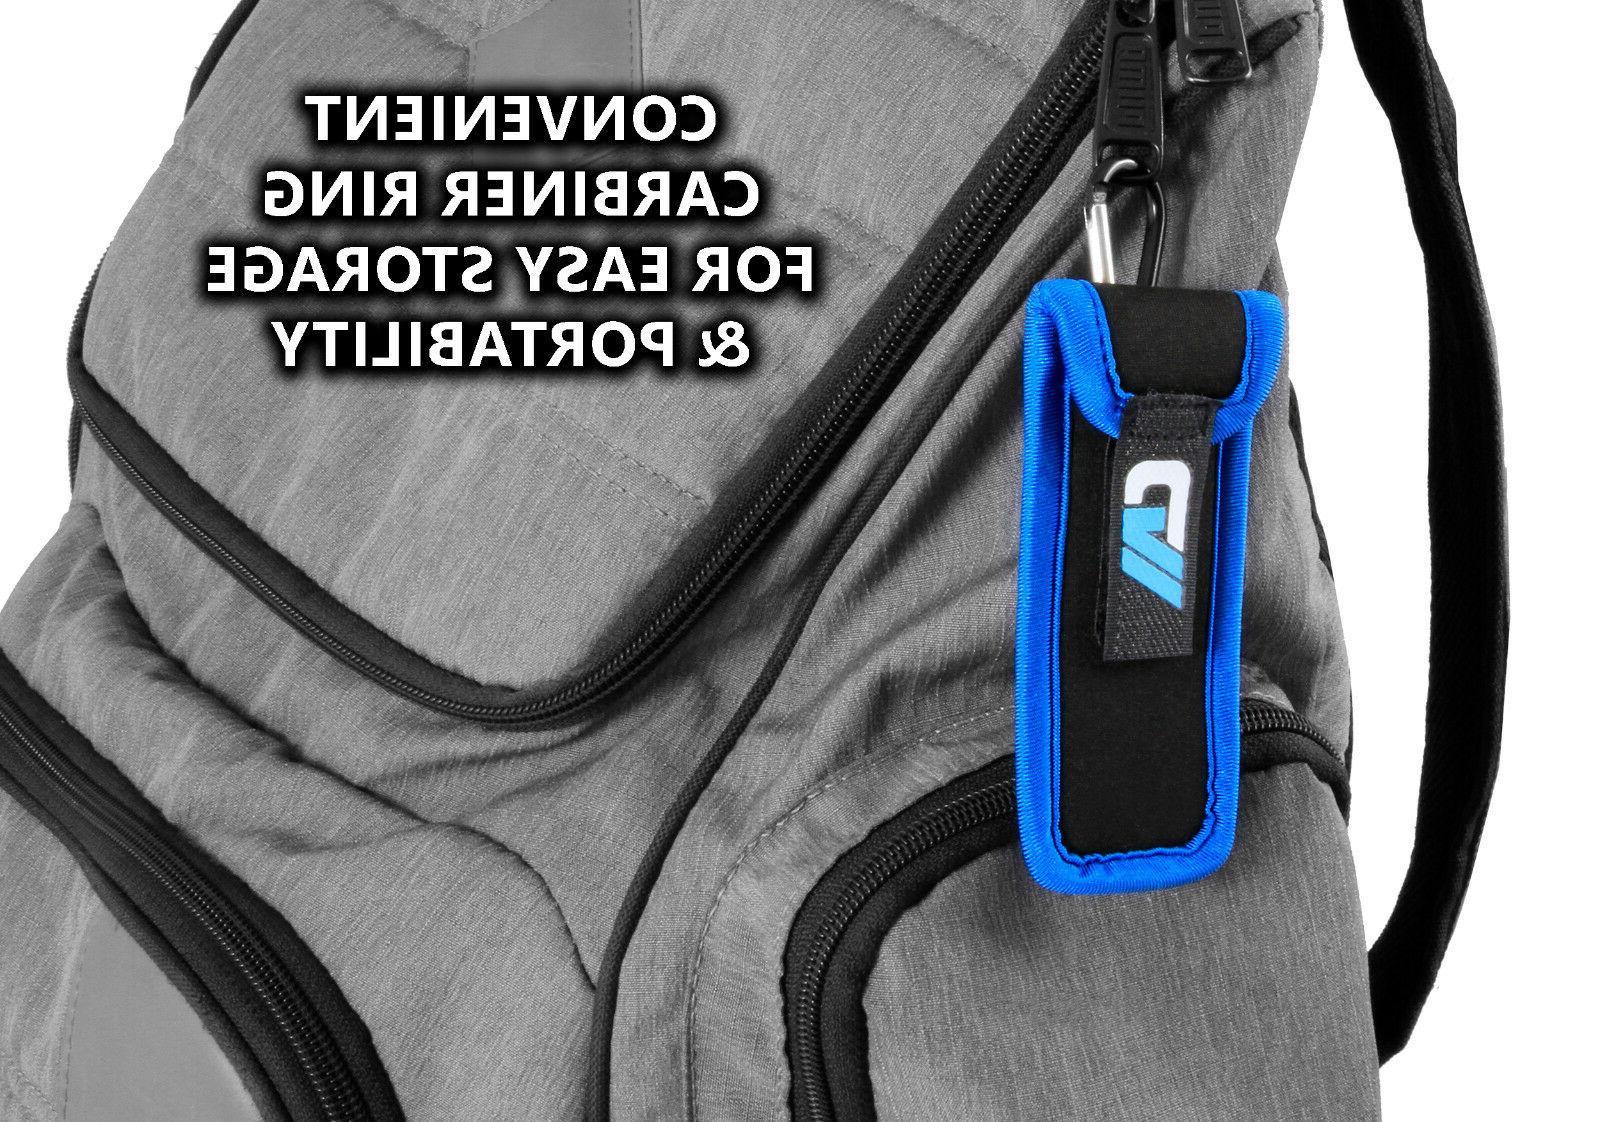 Carry Digital 8GB 3072Kbps